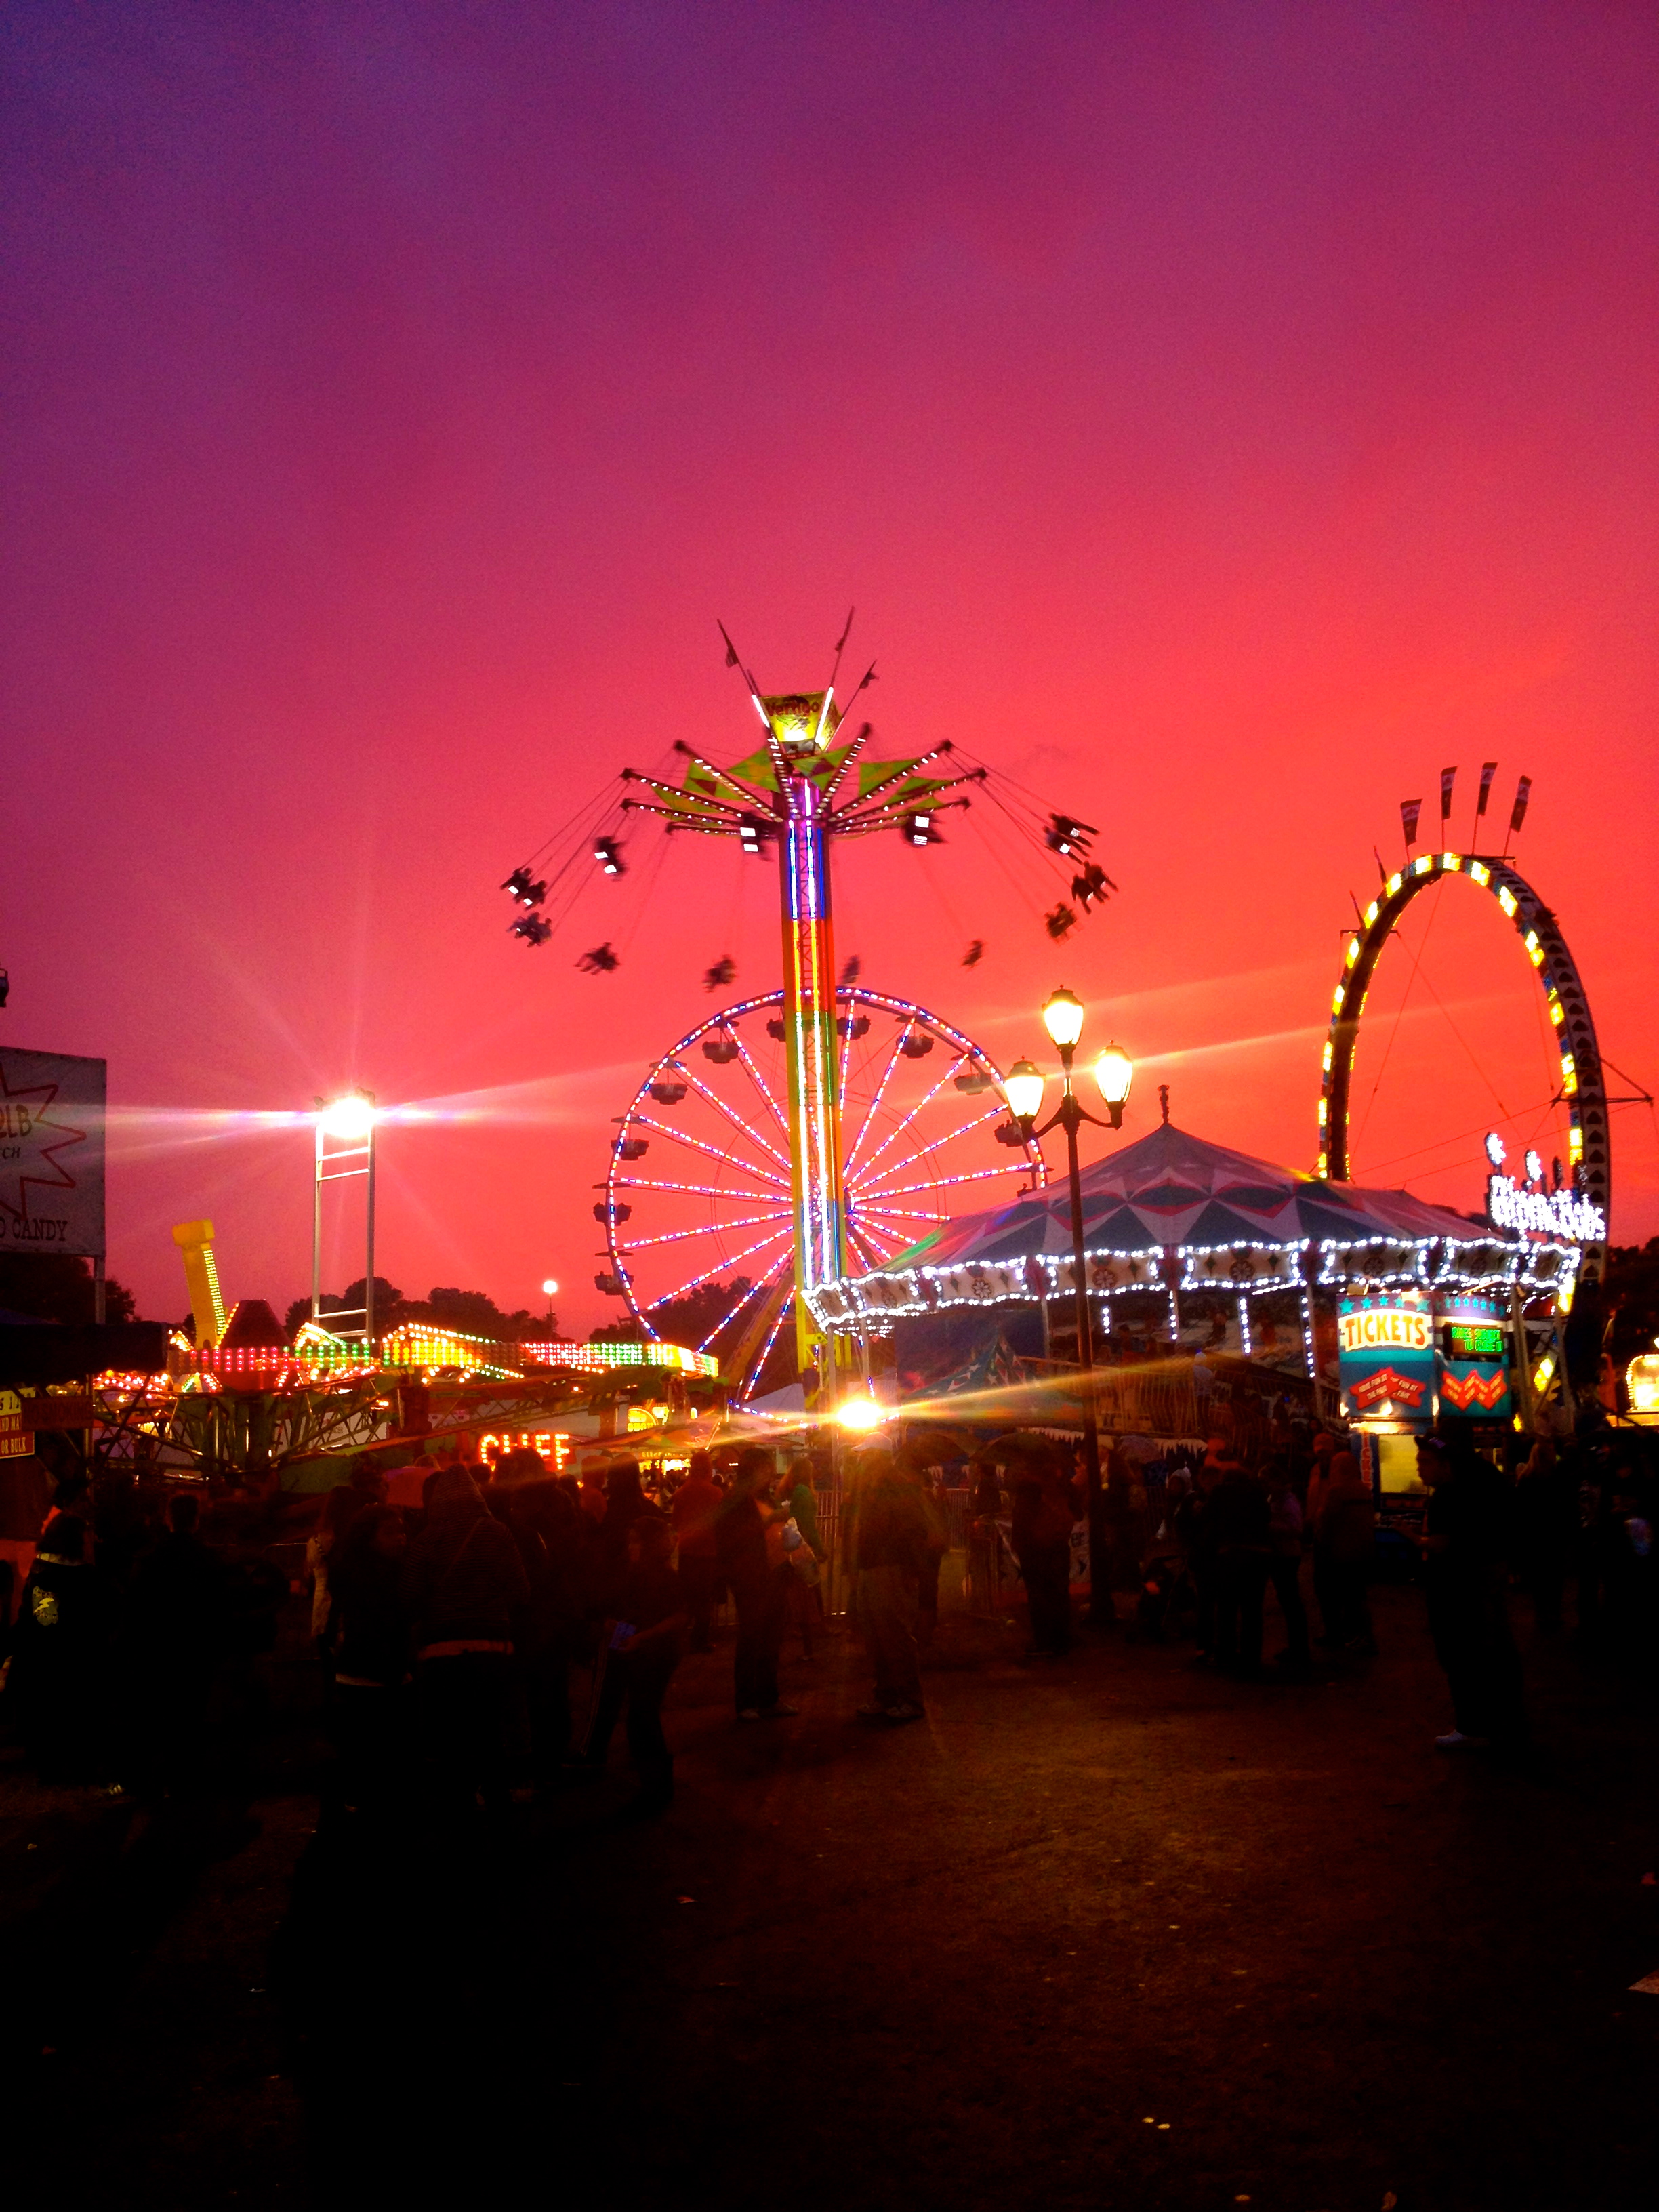 File:NC State Fair Sunset.jpg - Wikimedia Commons